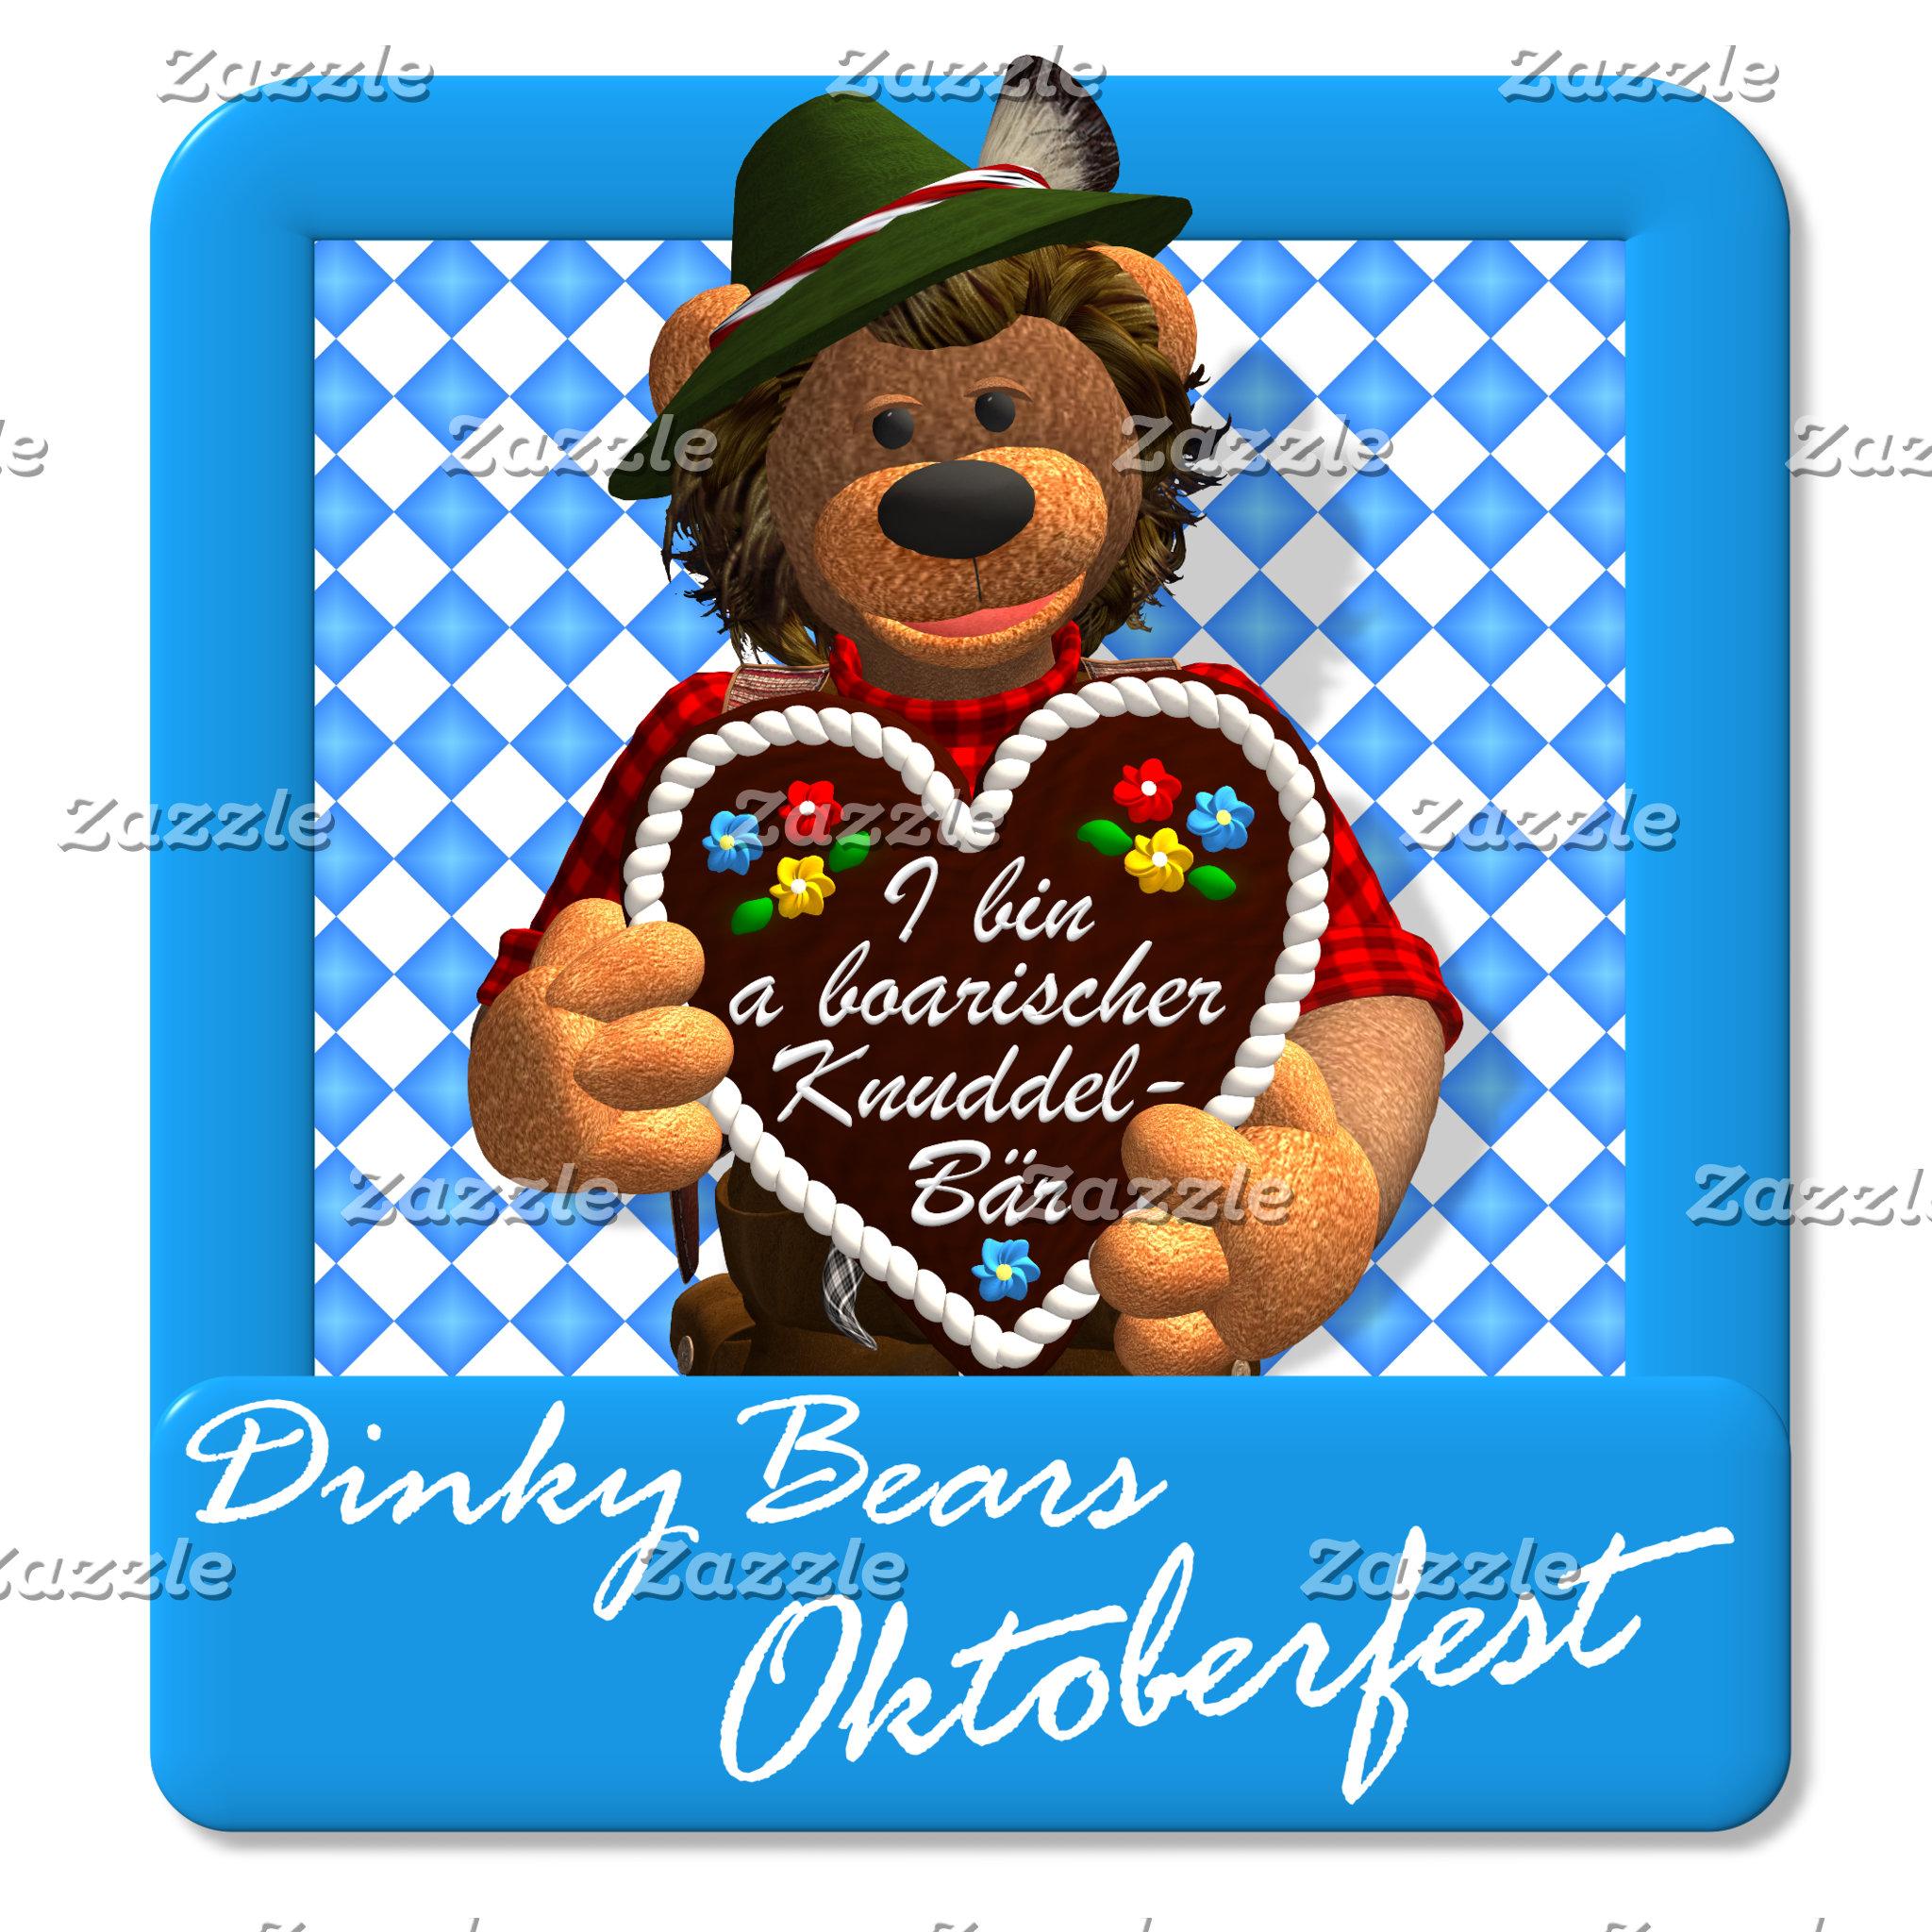 Dinky Bears Oktoberfest